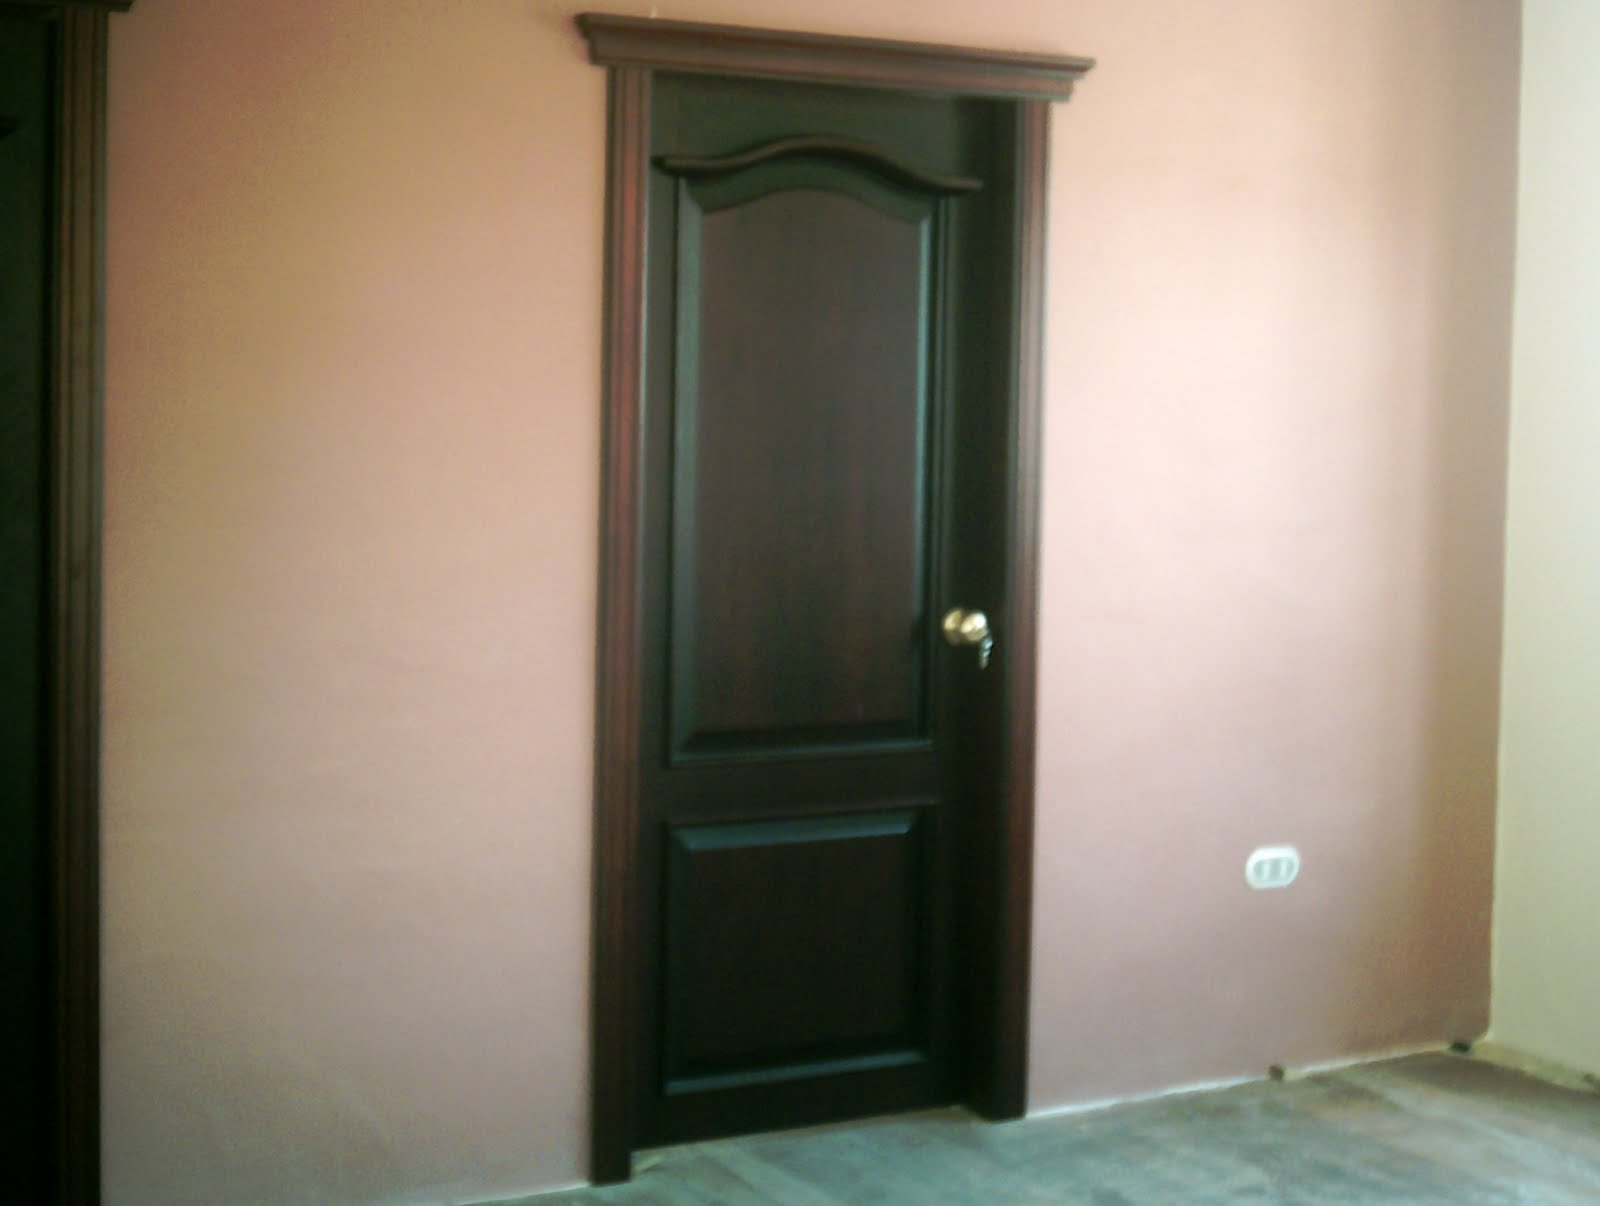 Ideatumobiliario puertas interiores y exteriores para su for Puertas de madera para interiores precios